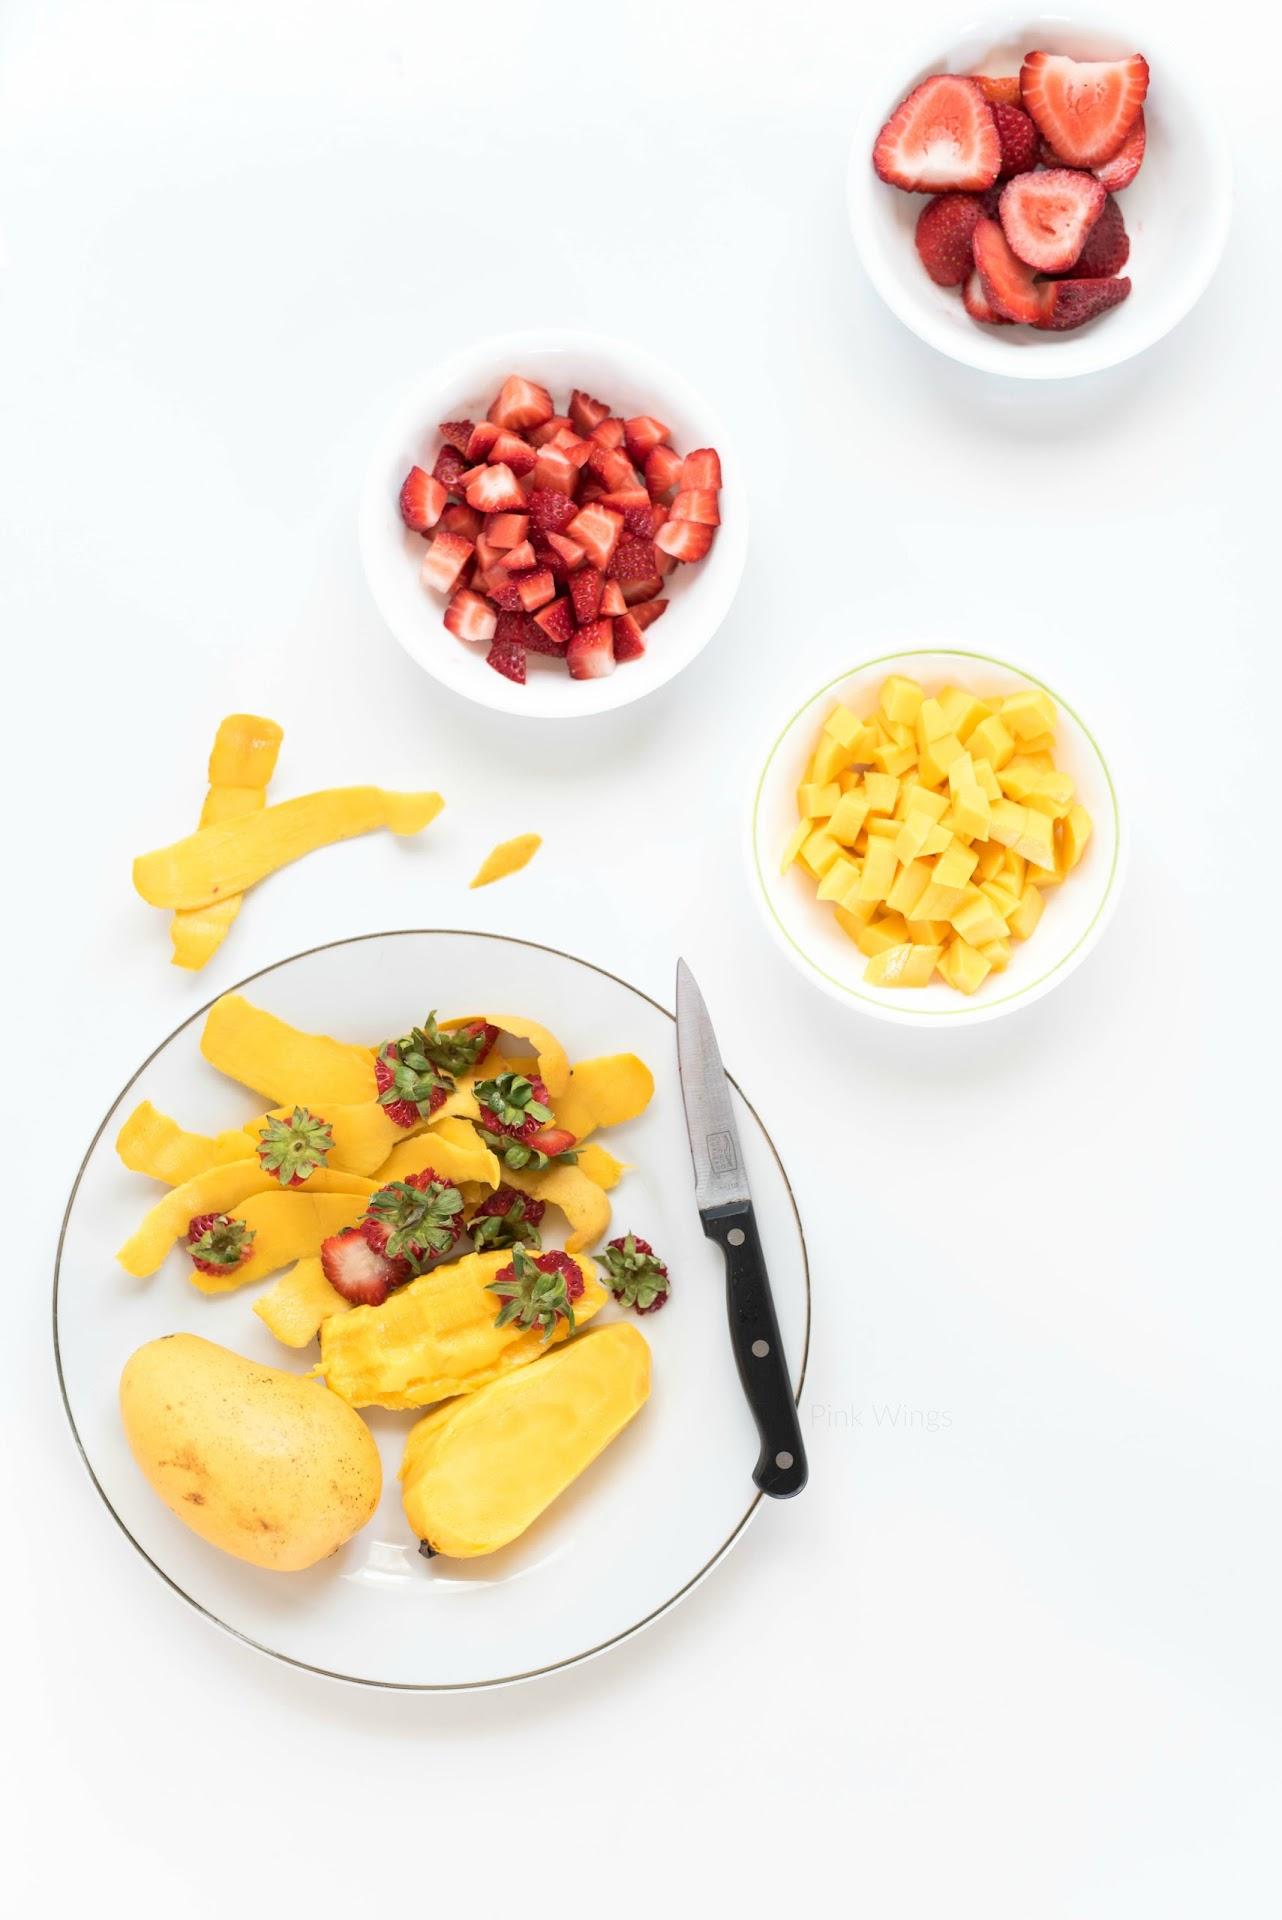 mango recipe, strawberry, refreshing summer recipes, unique summer recipes, asian food blog